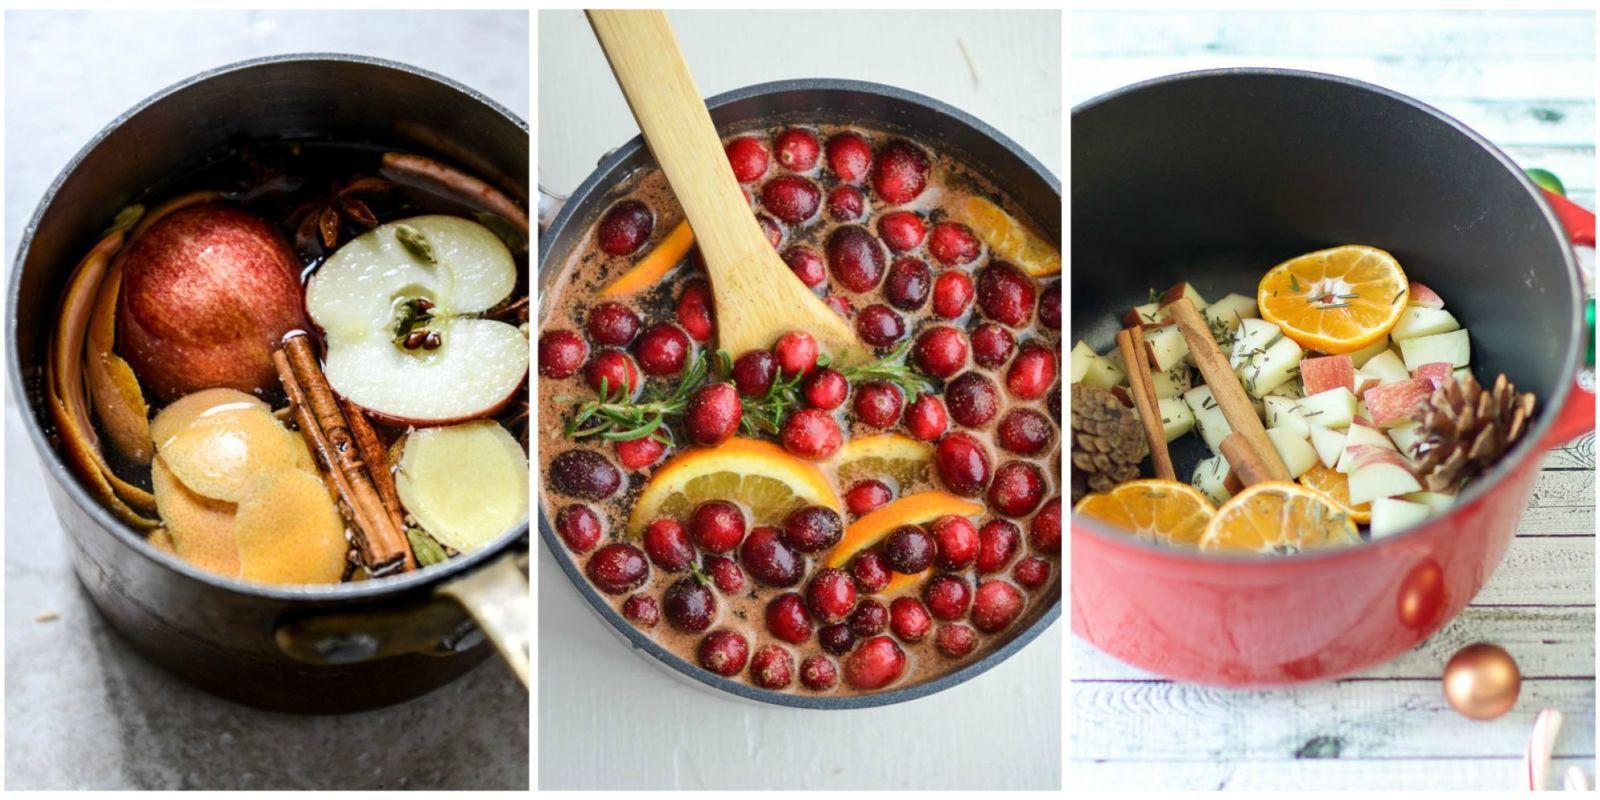 10 Homemade Stovetop Potpourri Recipes How To Make Simmering Potpourri